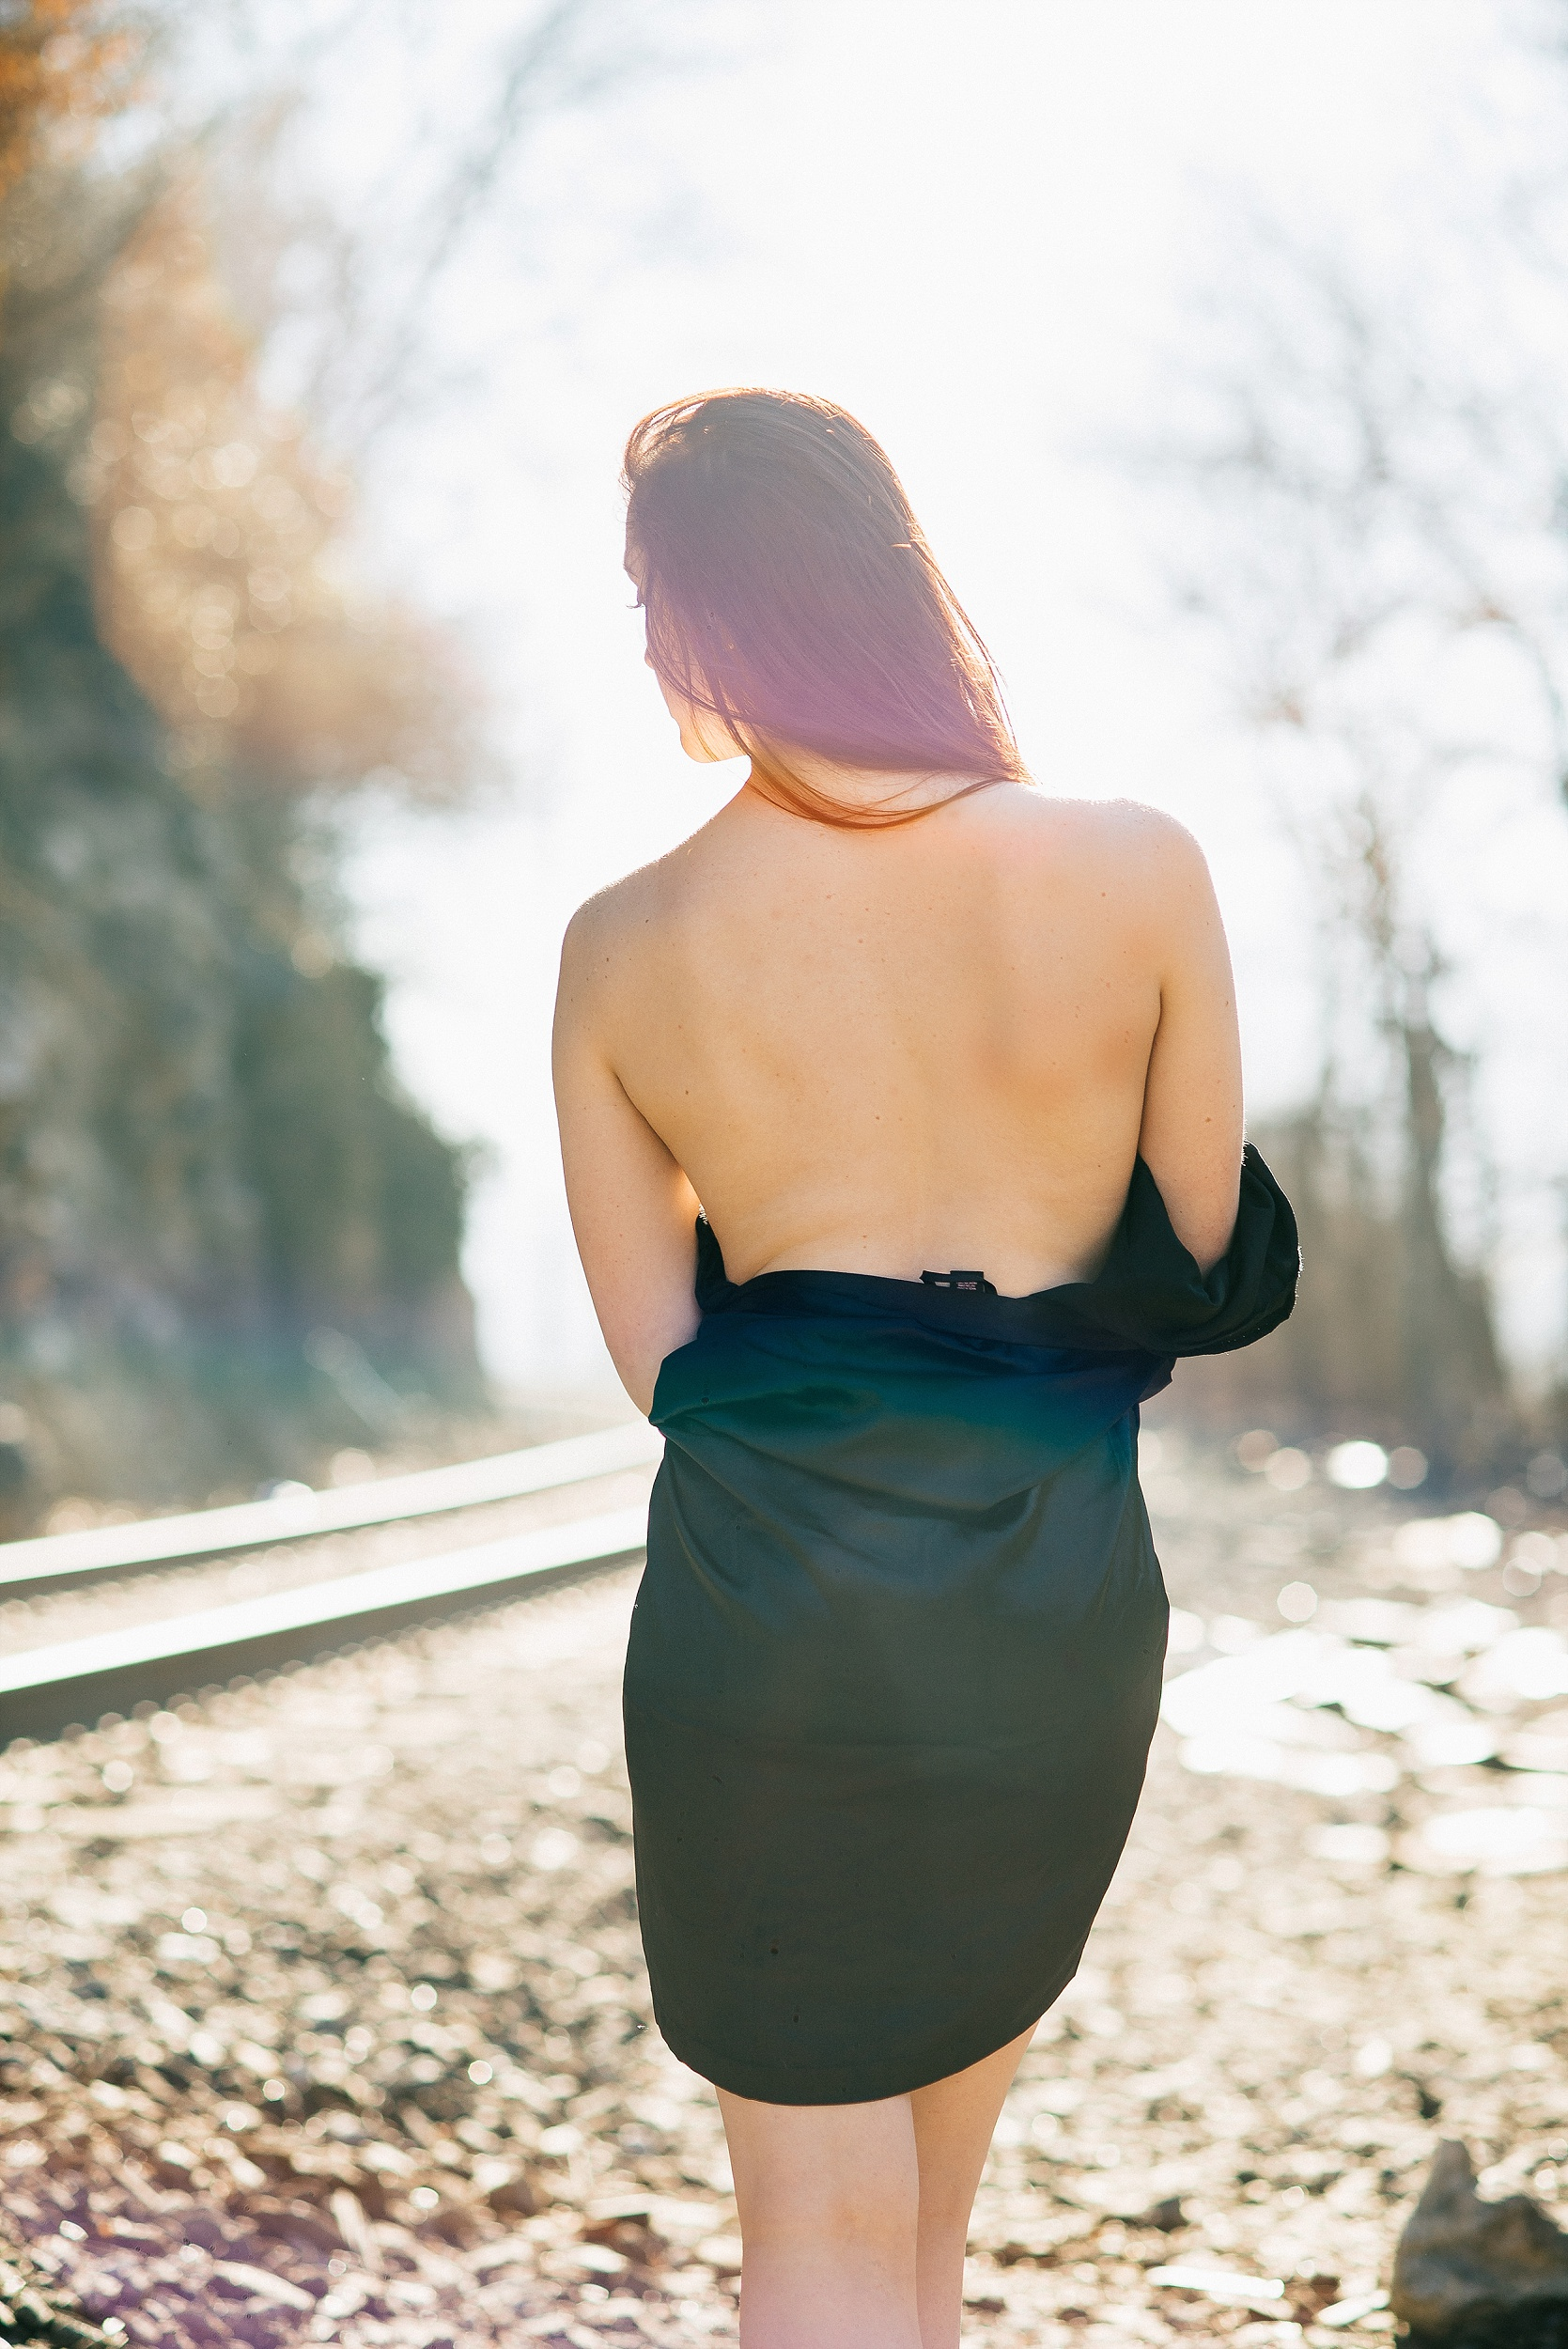 Boudoir by the tracks